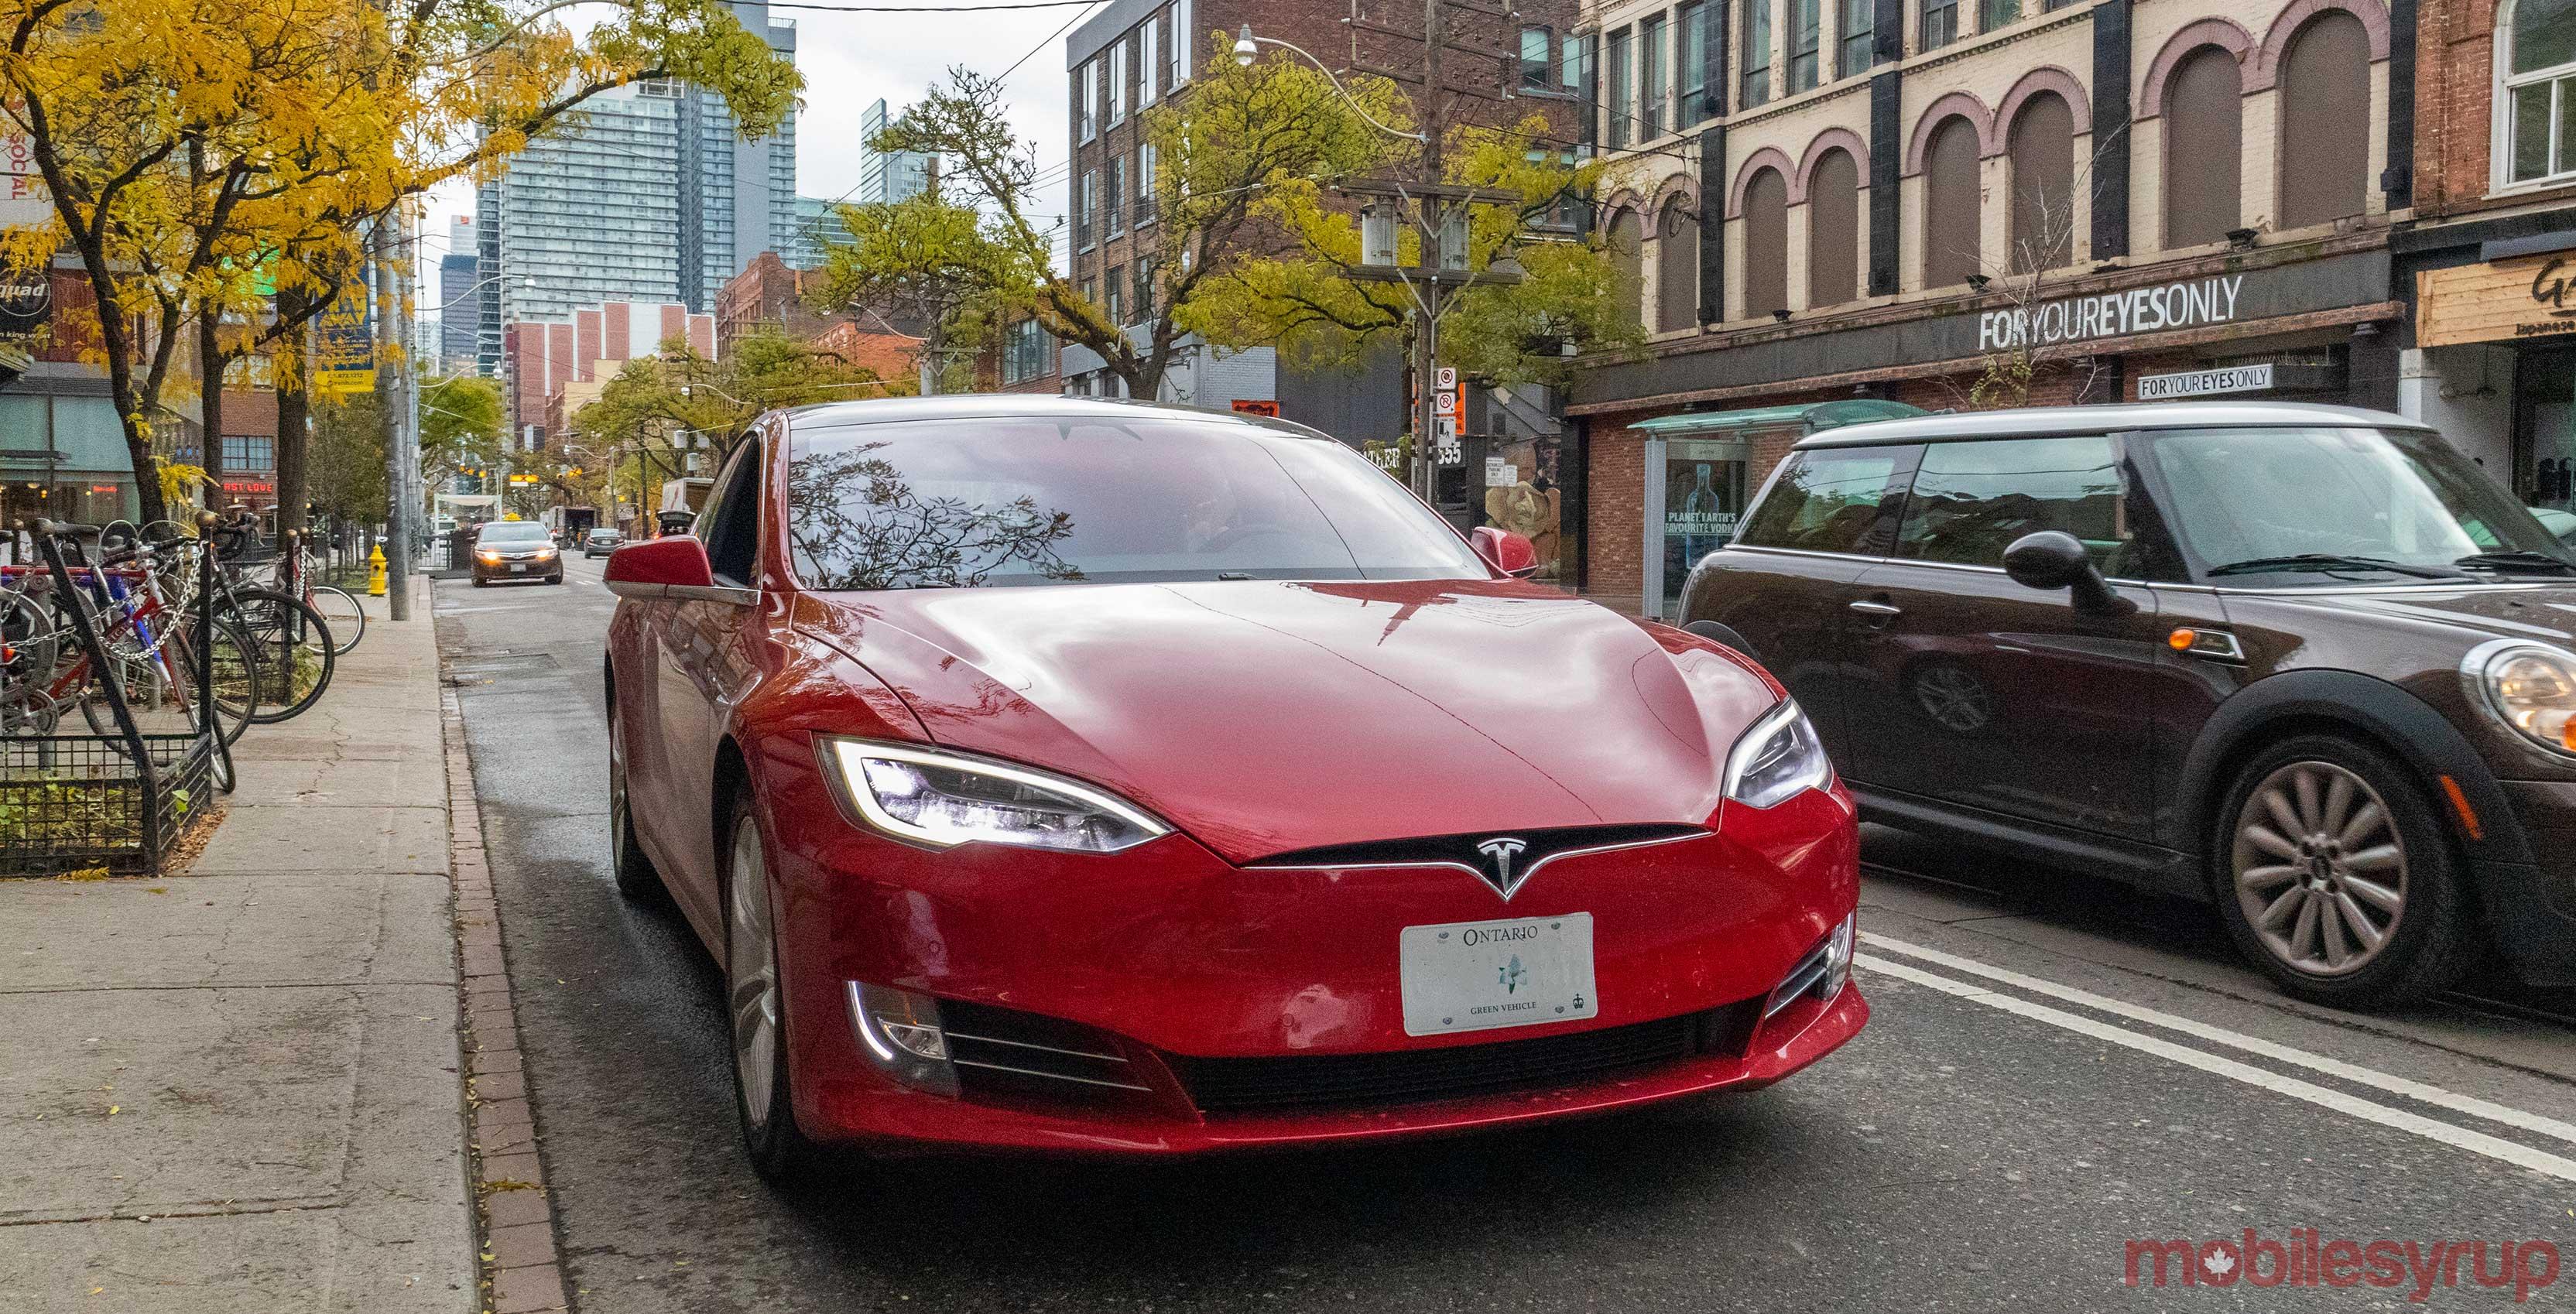 Tesla Model S value depreciates slower than other EVs: study